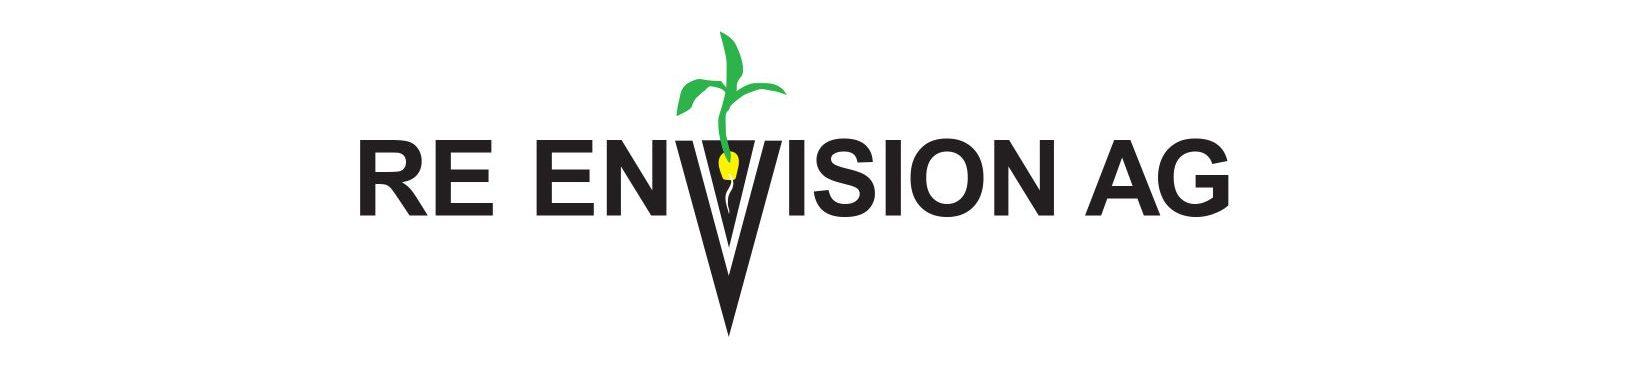 ReEnvisionAg